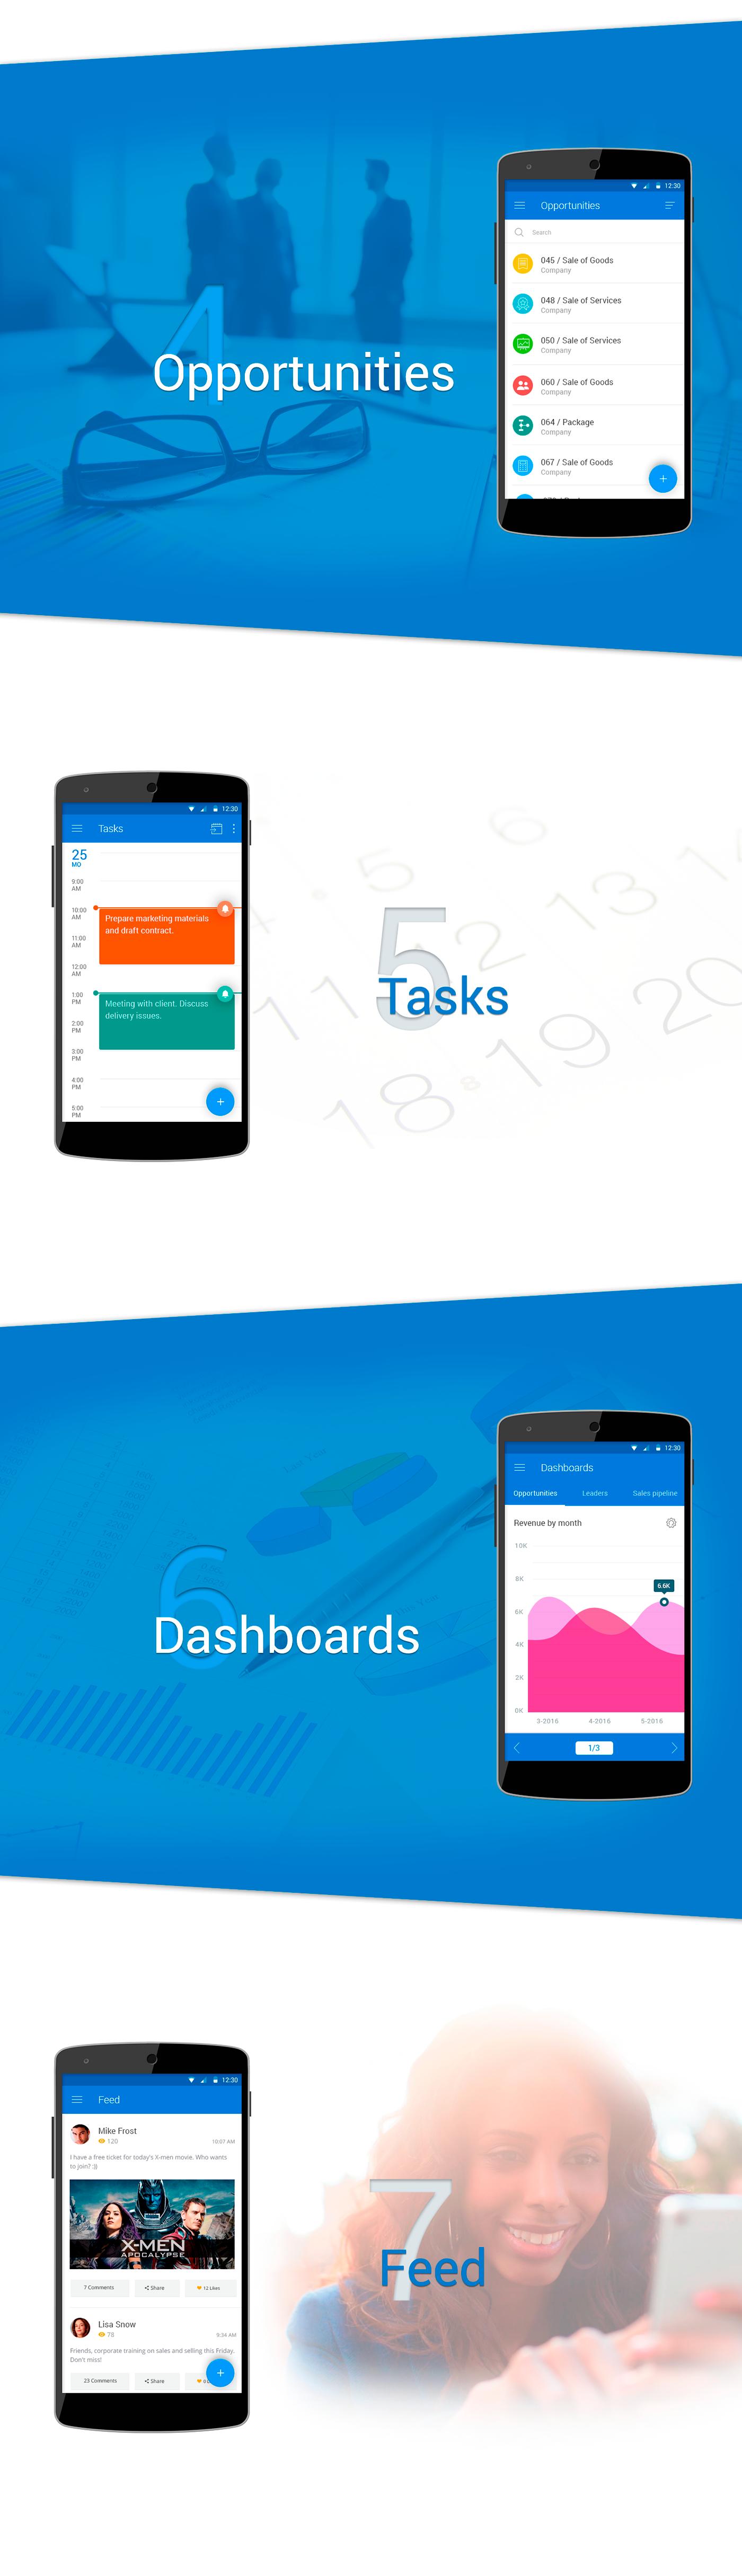 CRM Mobile app prototype free psd Mockup template